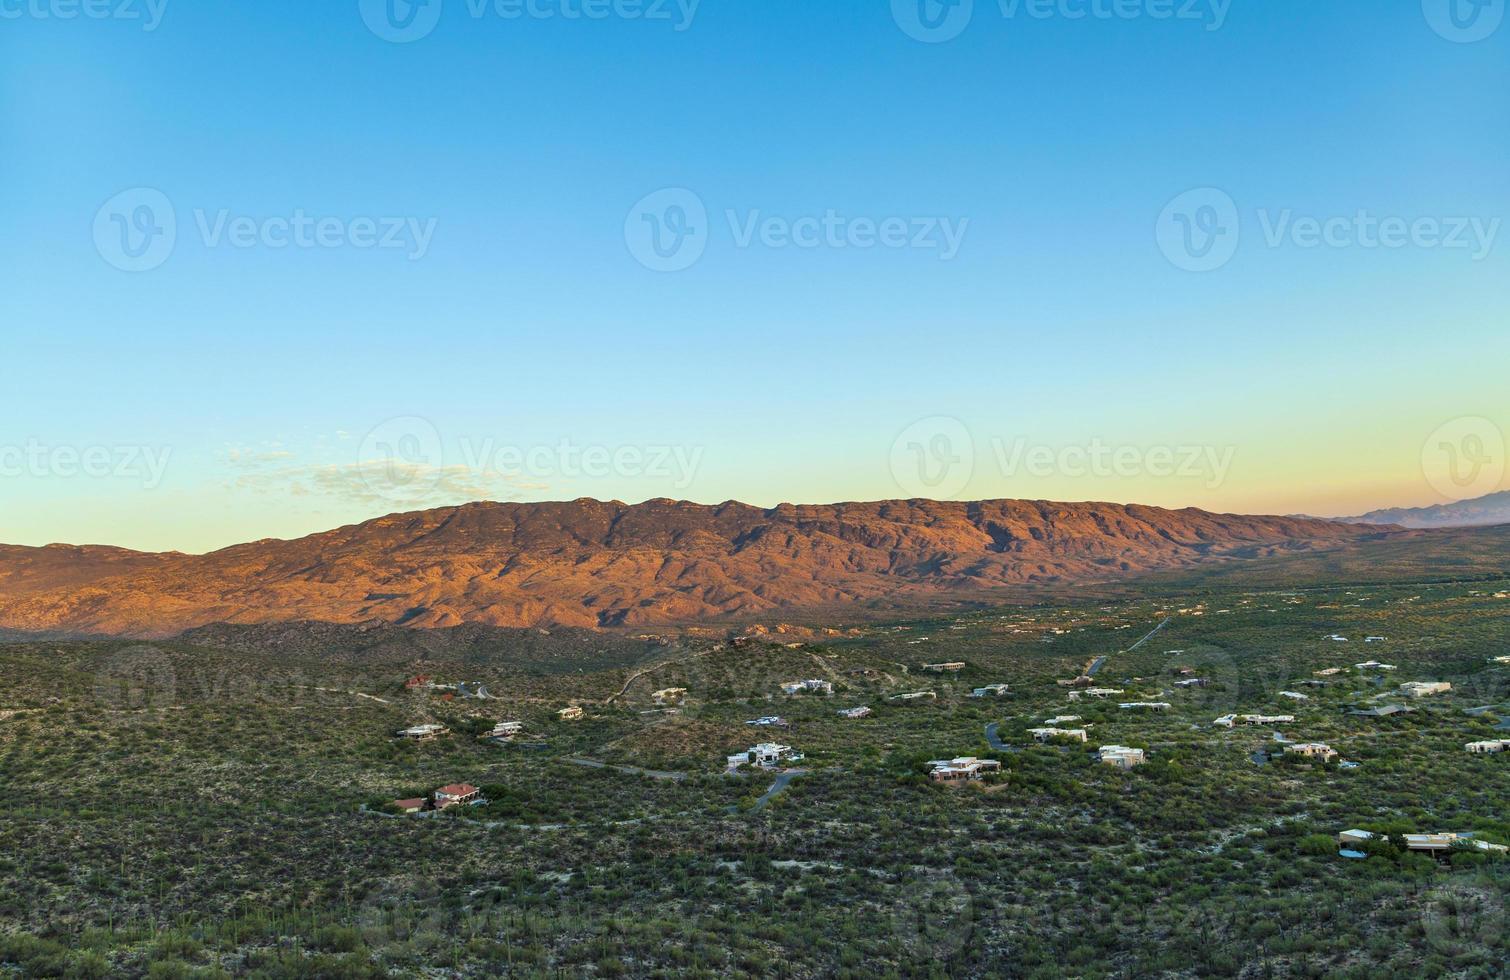 Golden Sunset en Tuscon, Arizona con cordillera foto